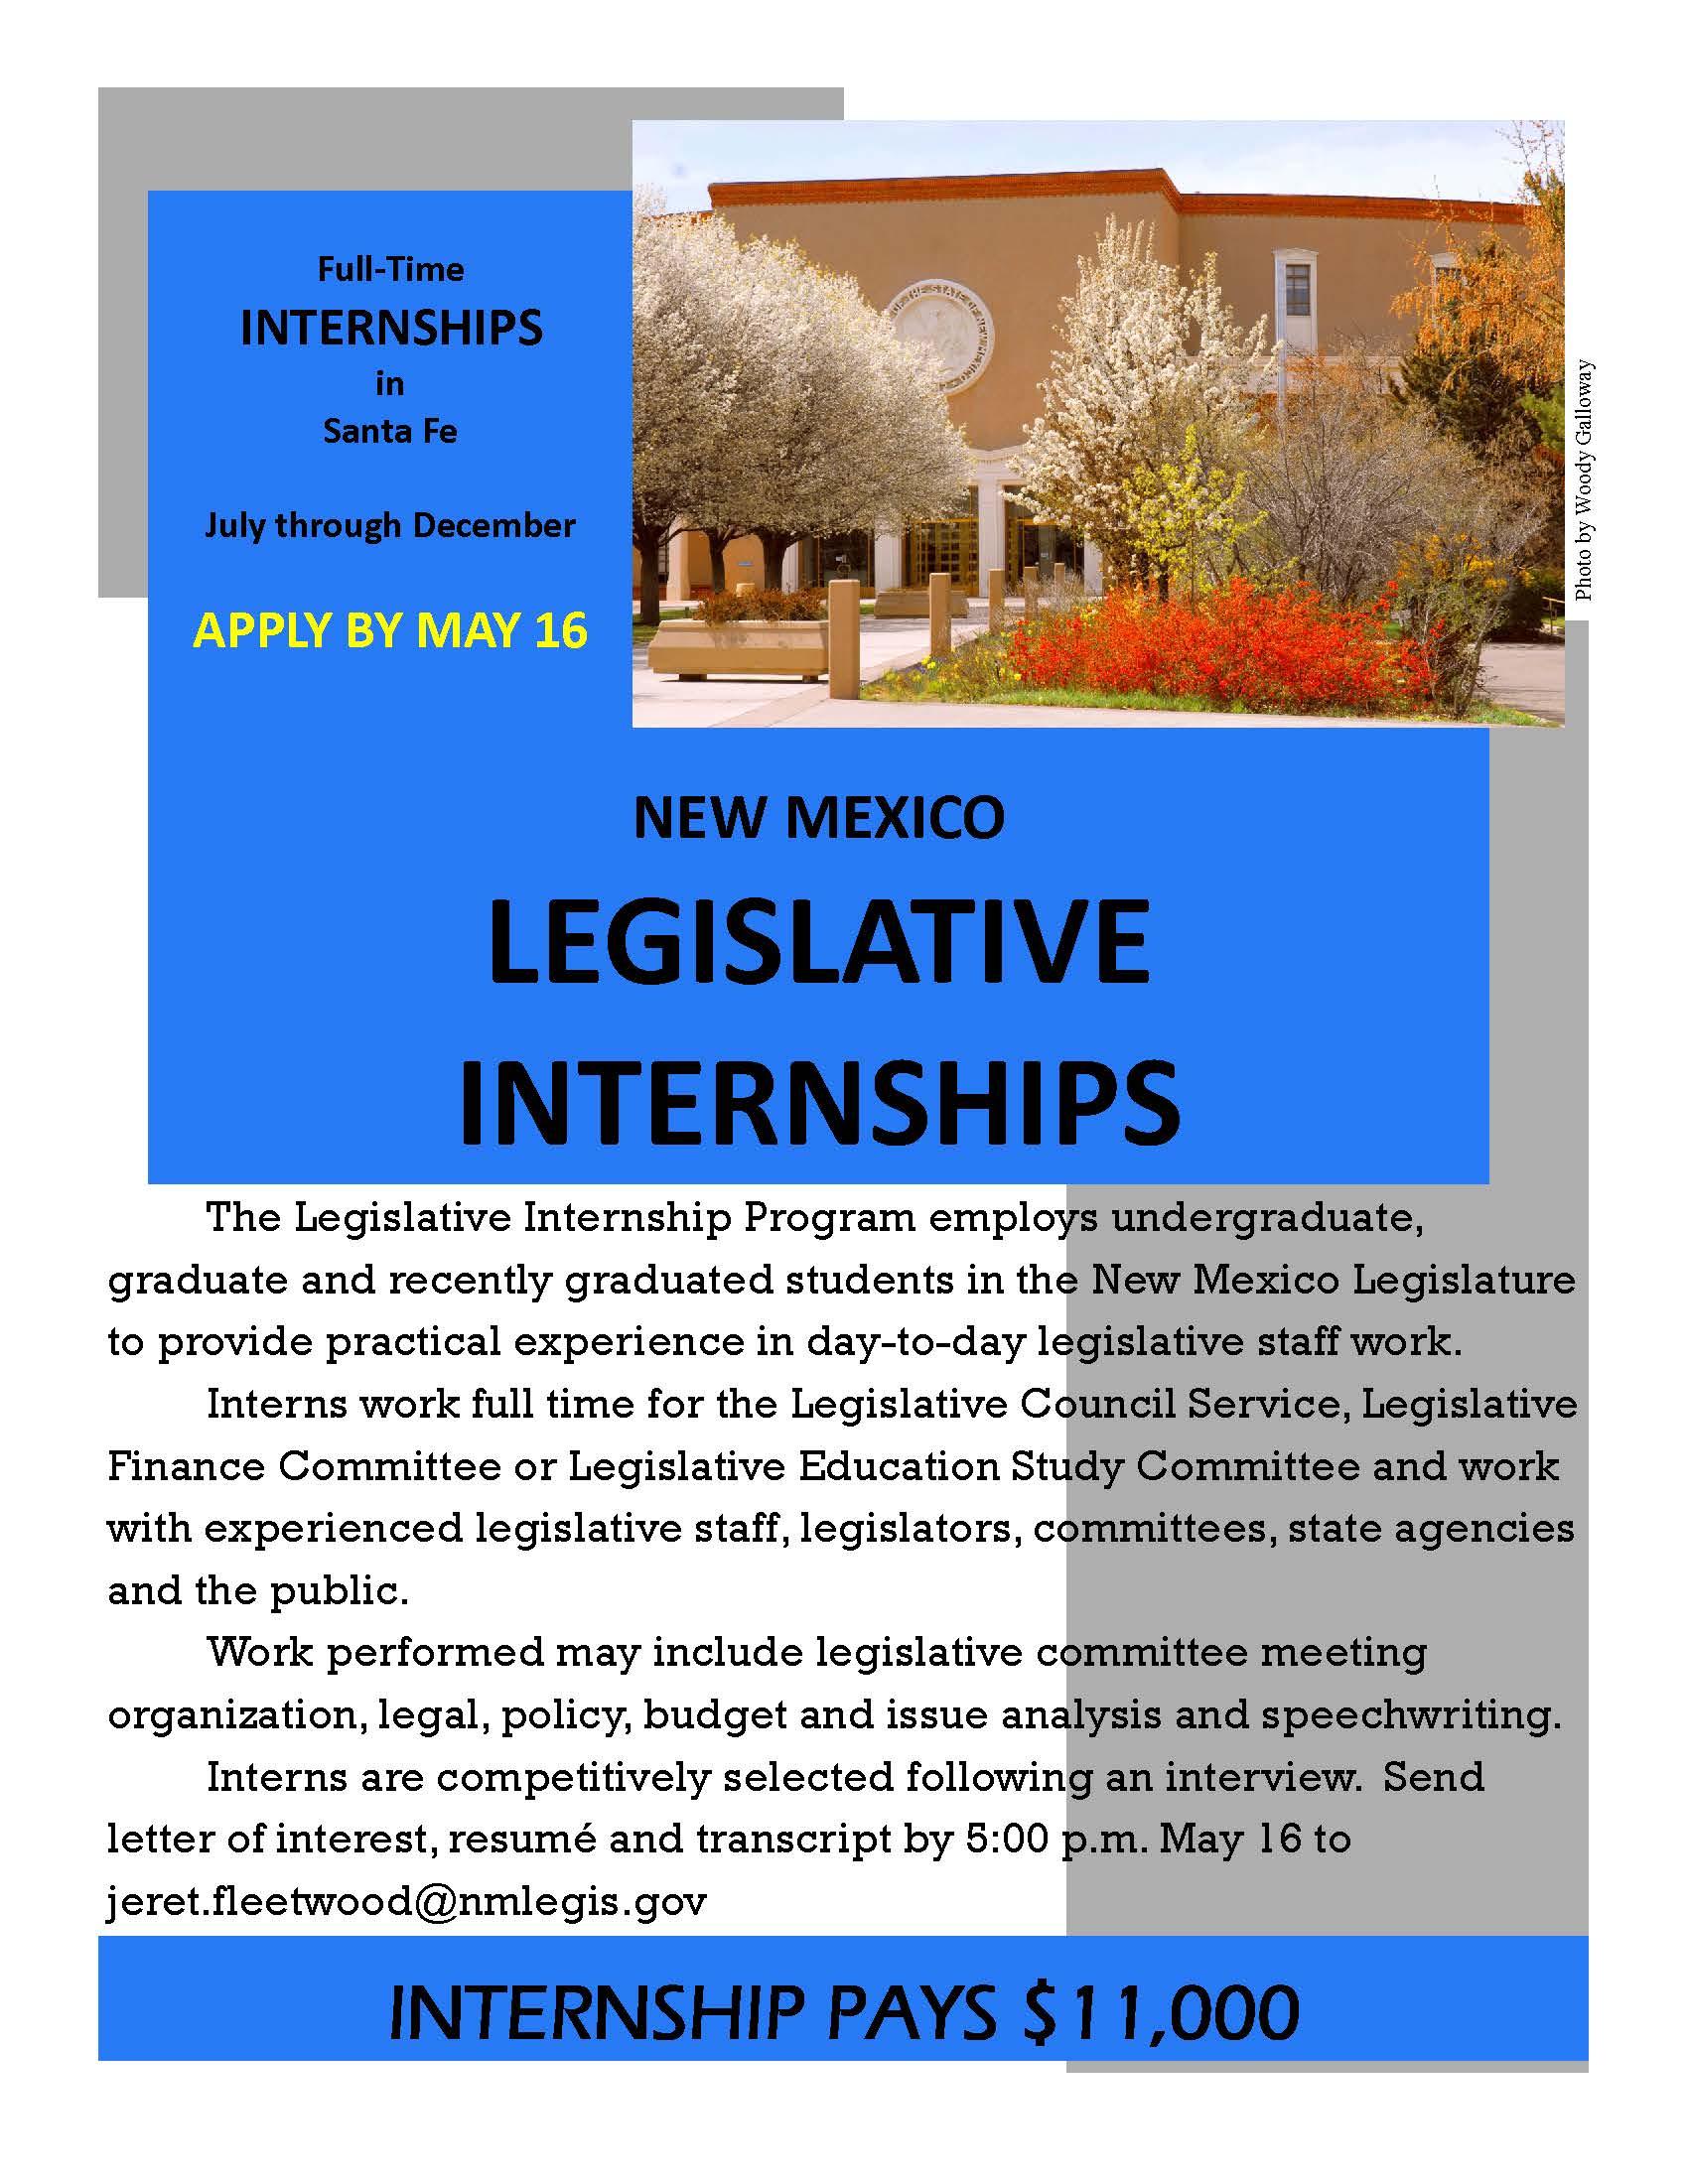 army intern programs hiring now